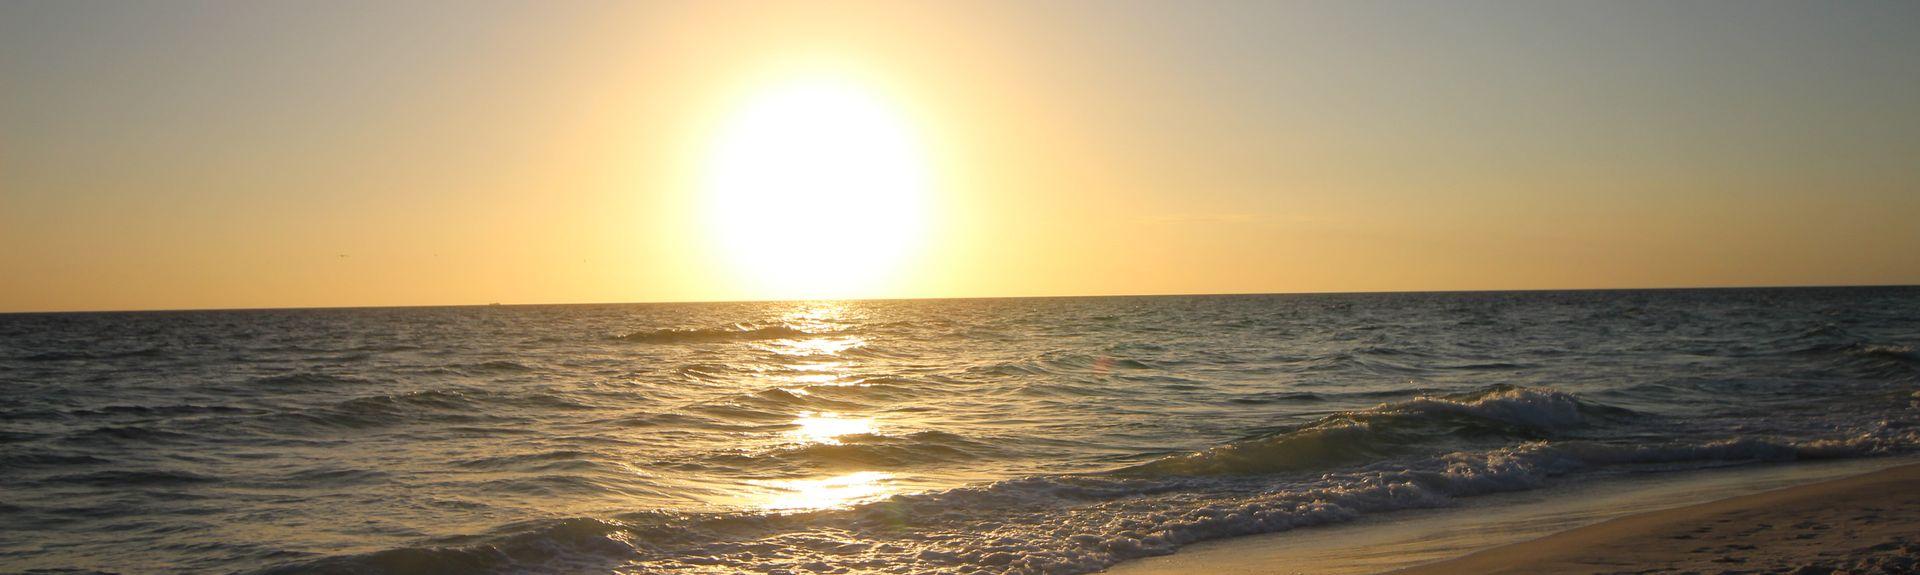 Largo Mar, Panama City Beach, Florida, United States of America